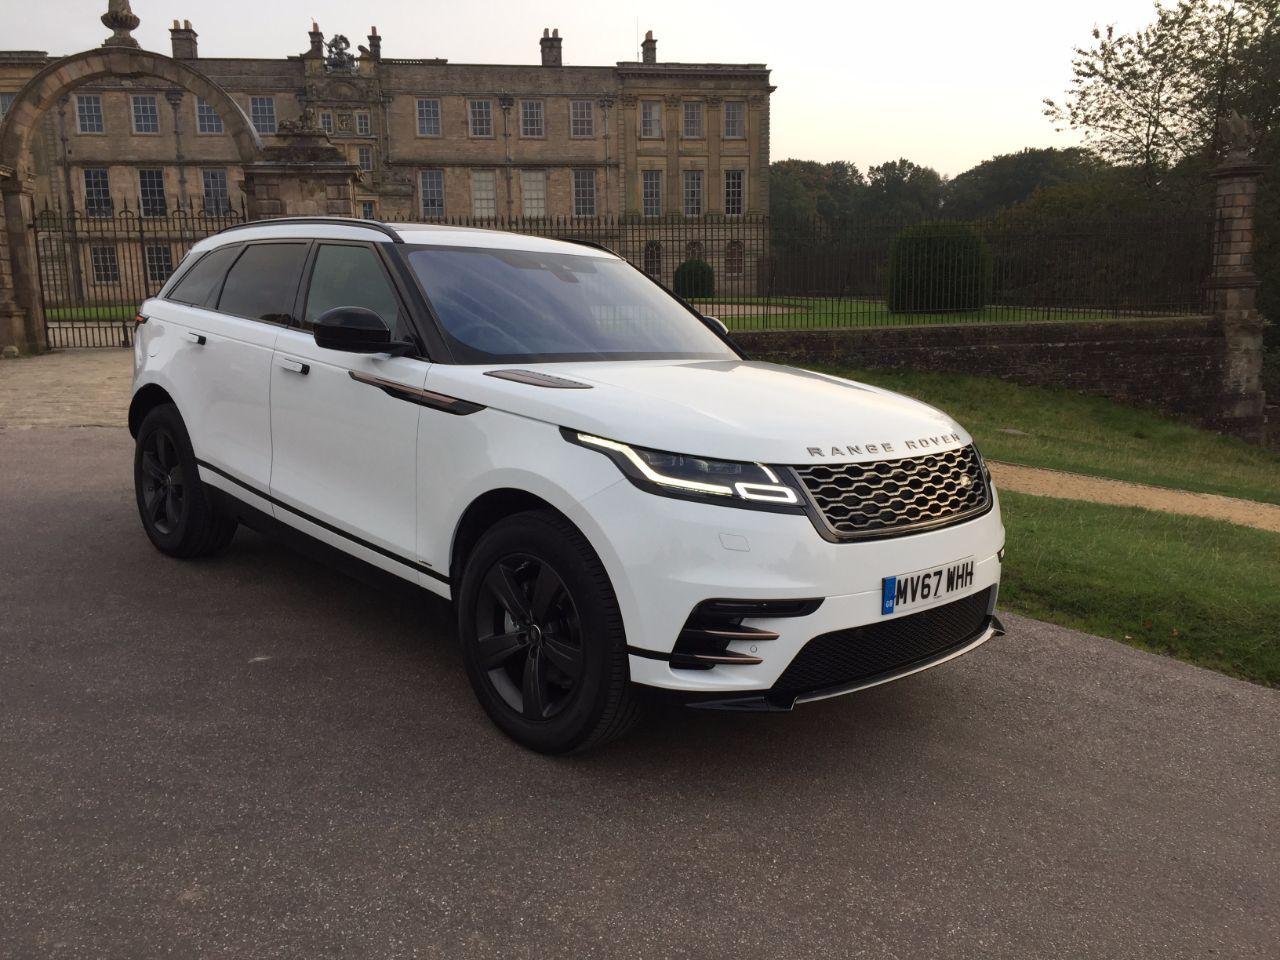 Cheap Land Rover Range Rover Velar 20 0 R Dynamic S 2017 40 250 Stockport In 2020 Land Rover Land Rover Car Range Rover